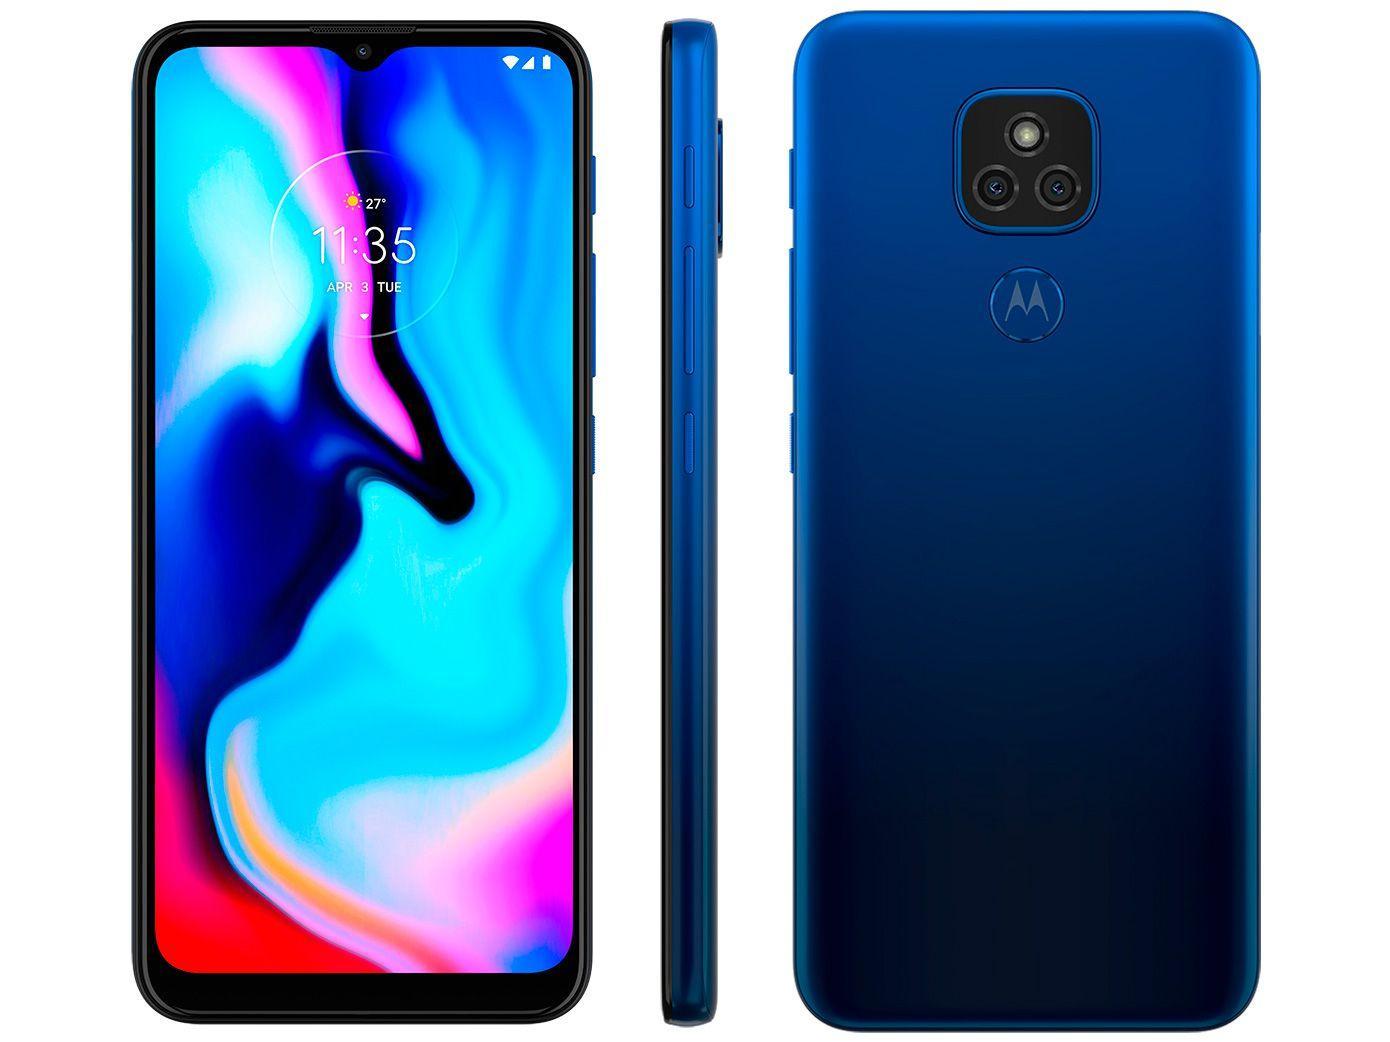 Smartphone Motorola Moto E7 Plus 64GB Azul Navy - 4G Octa-Core 4GB RAM 6,5? Câm. Dupla + Selfie 8MP